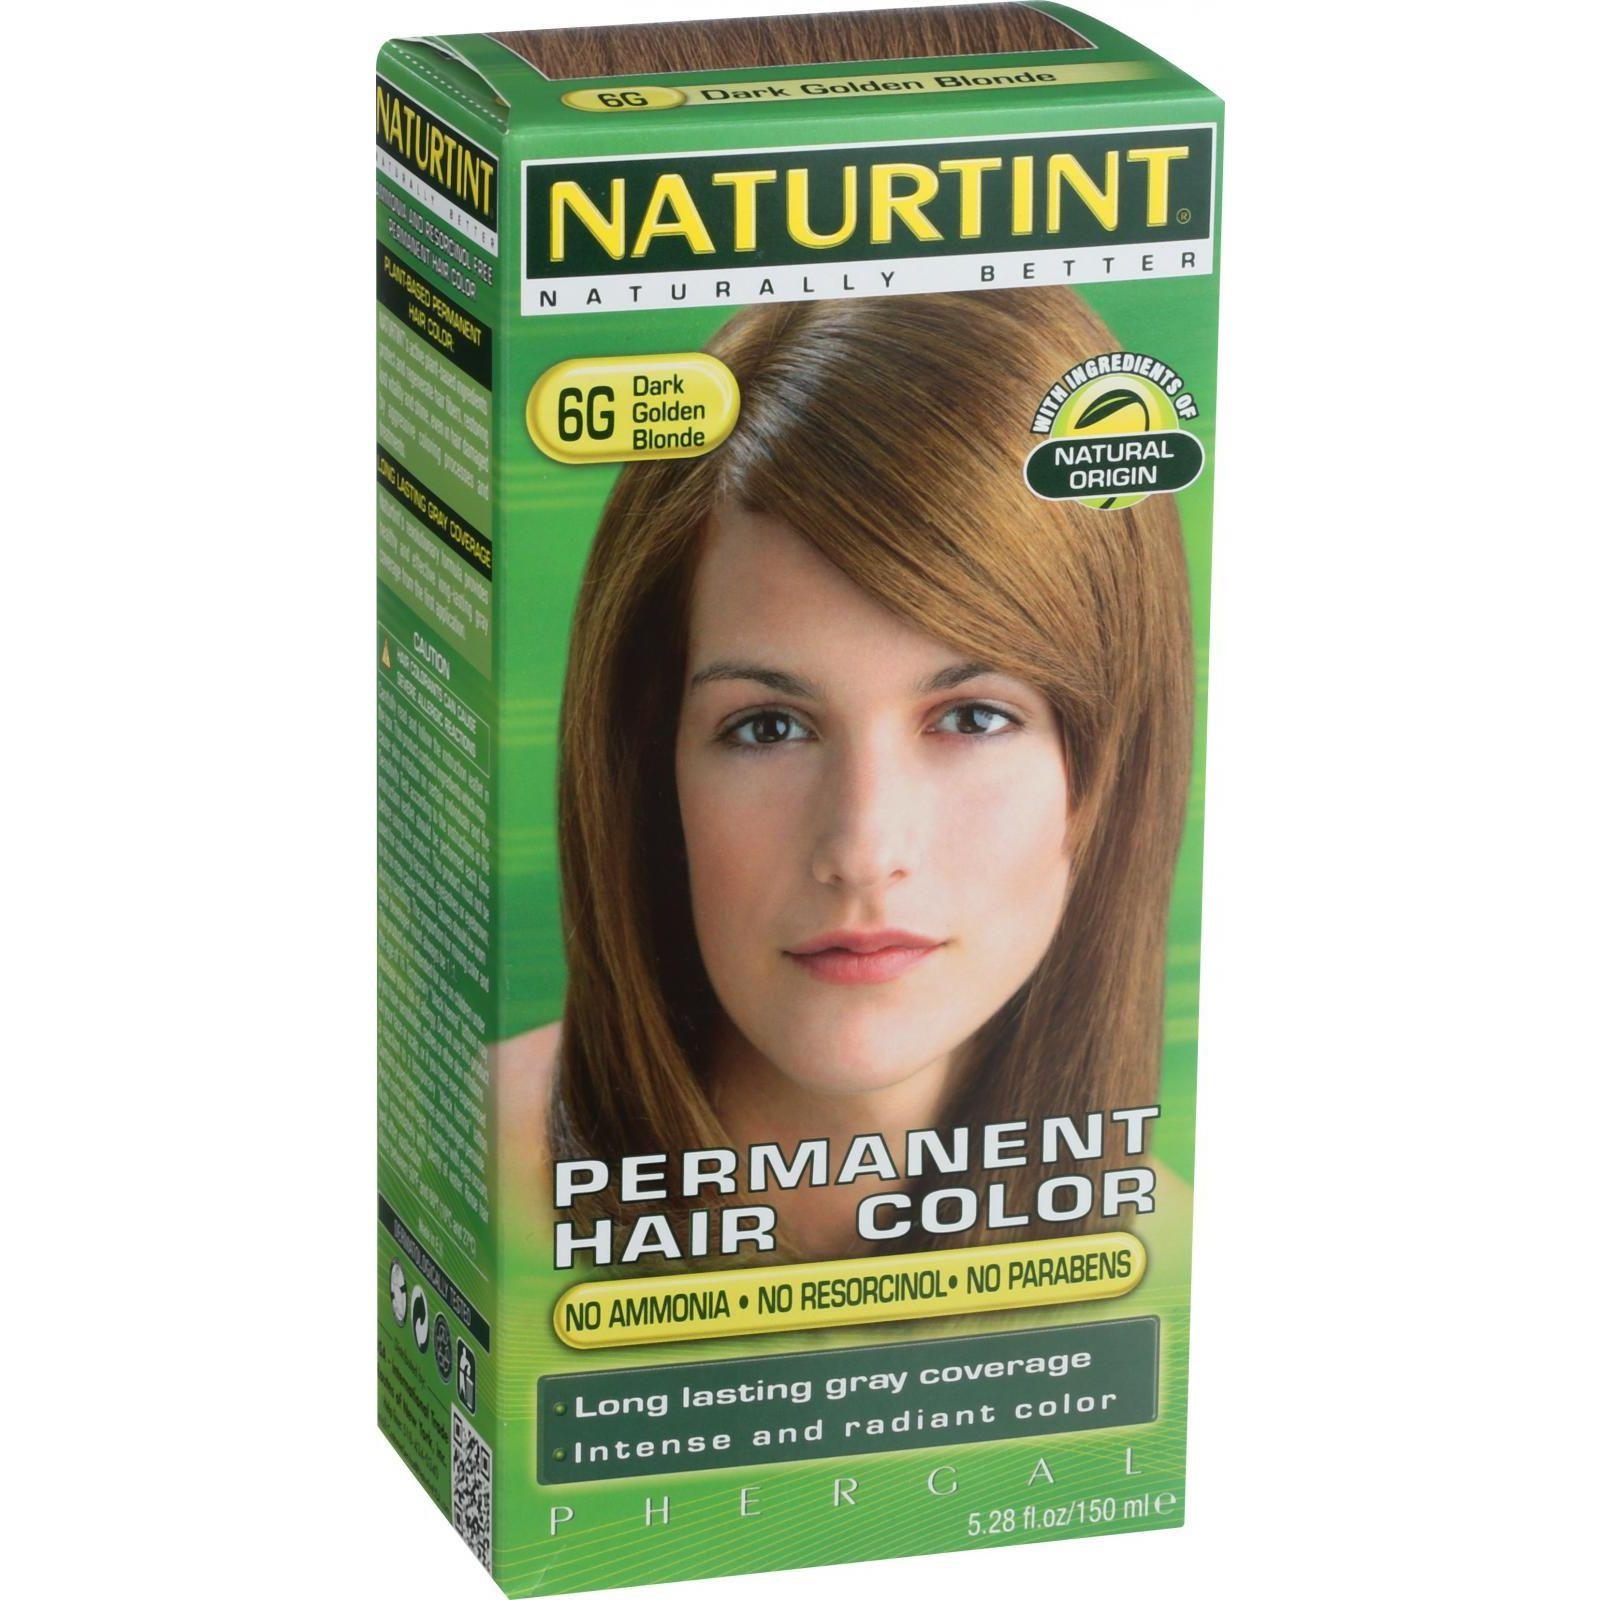 Phergal Naturtint Permanent Hair Color 56 Oz Walmart